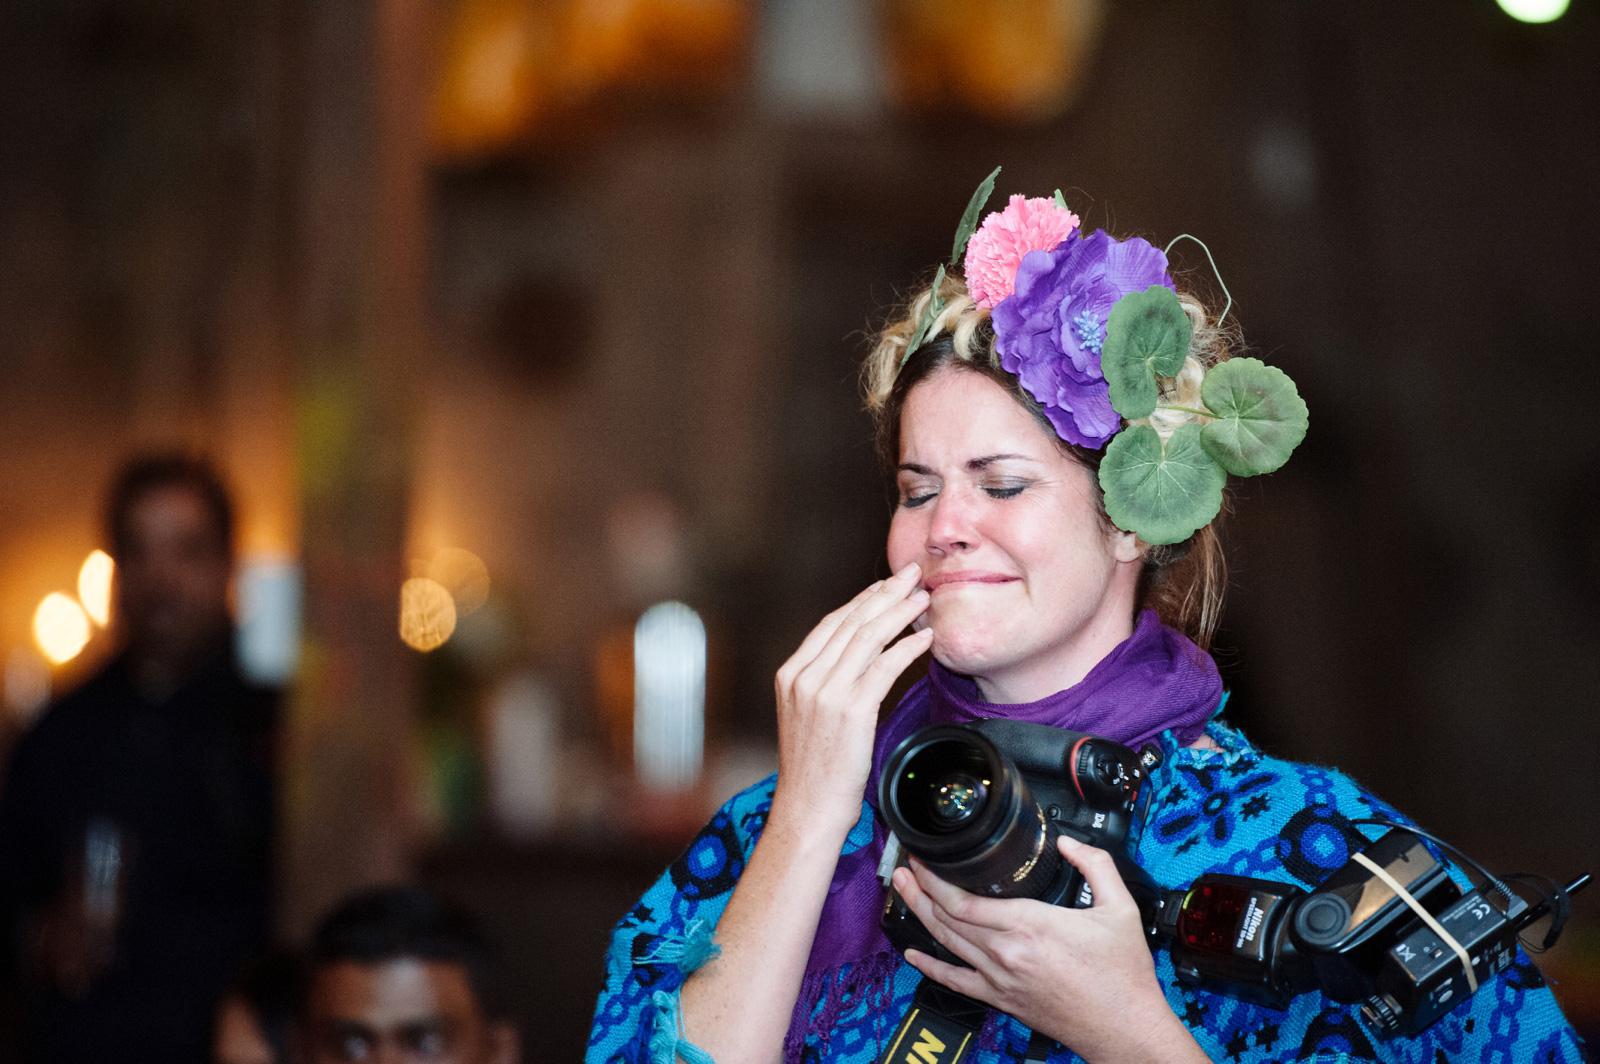 photographer crying at wedding